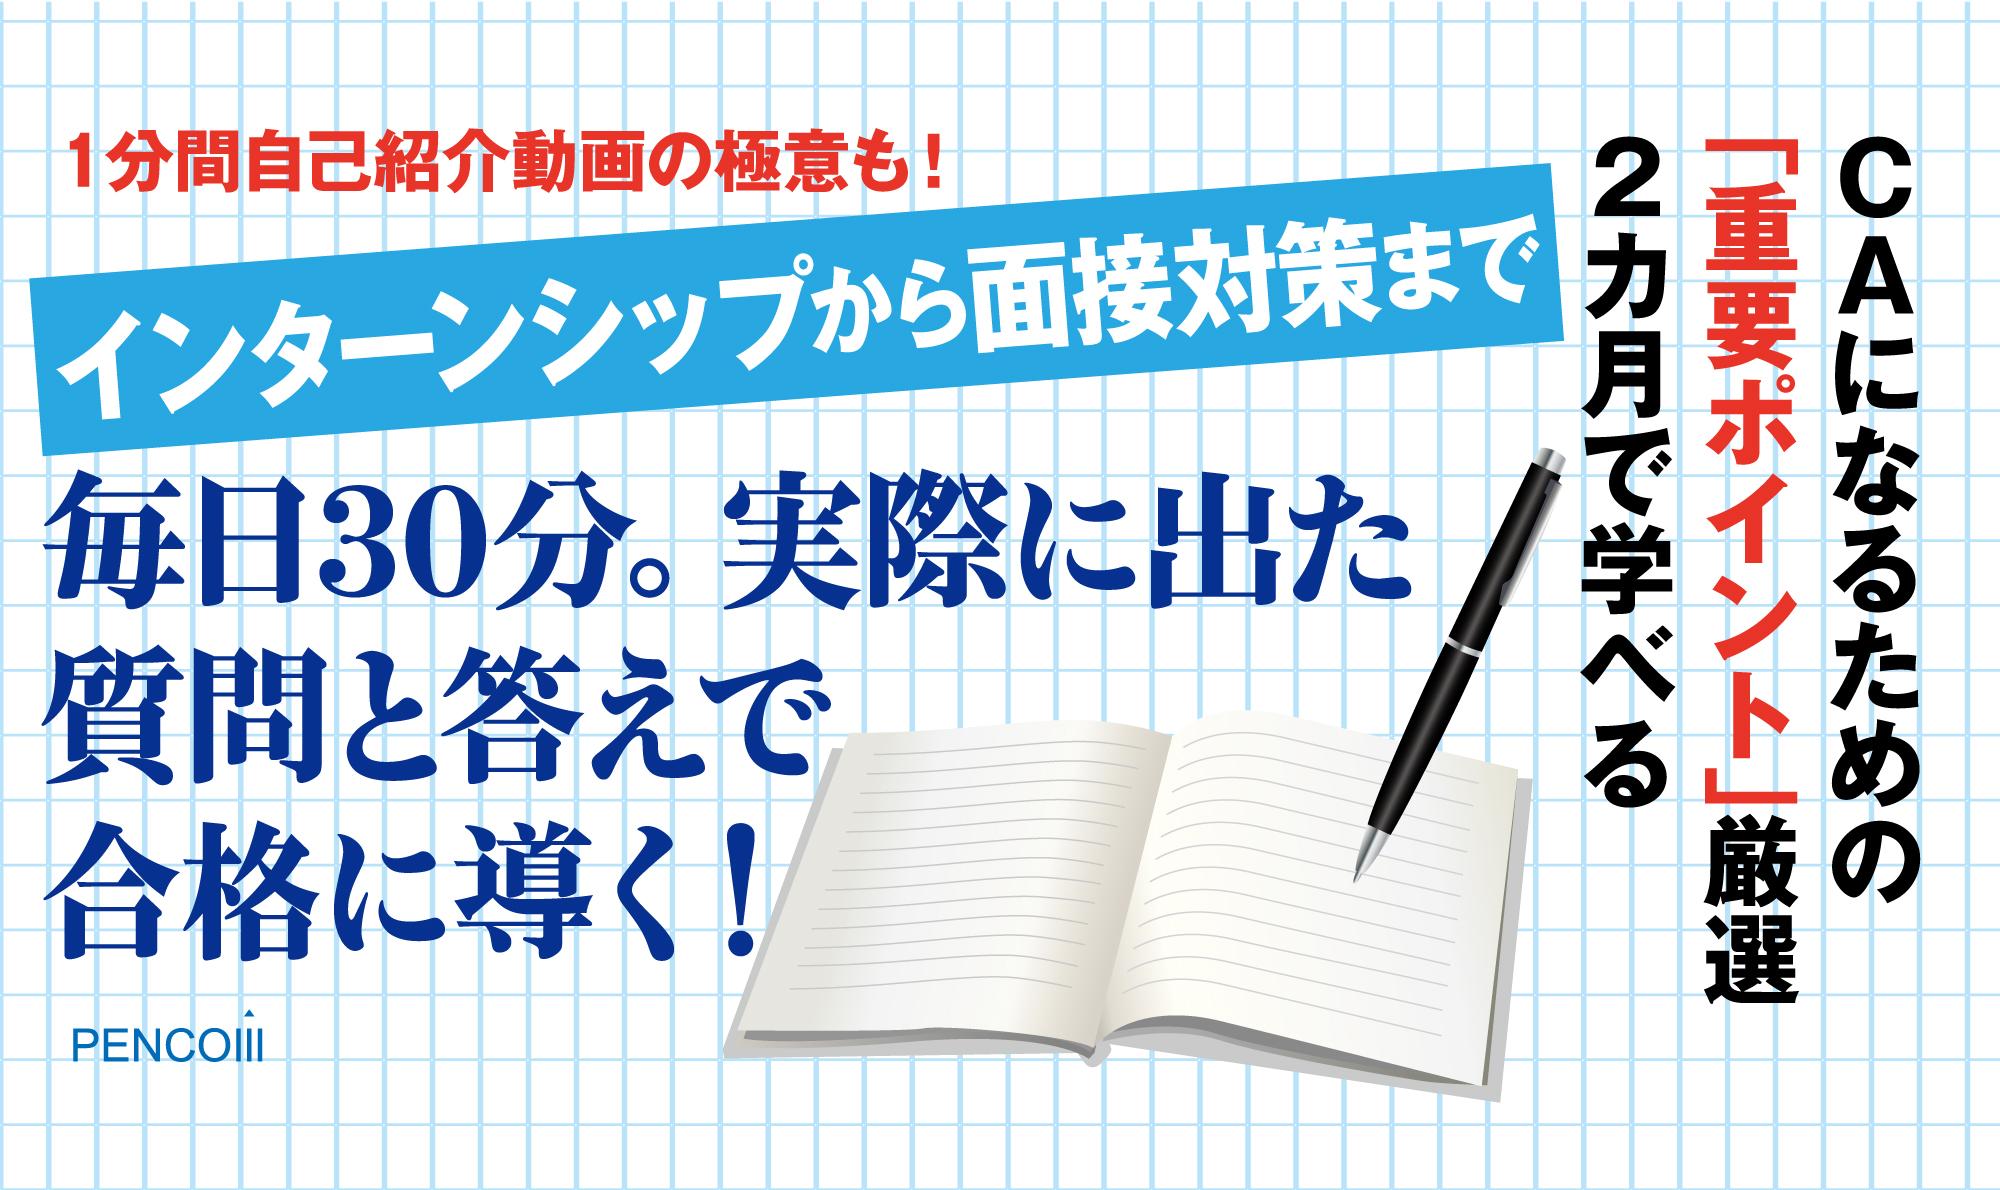 CA合格の教科書書き込み式ハンドブック2021就職版